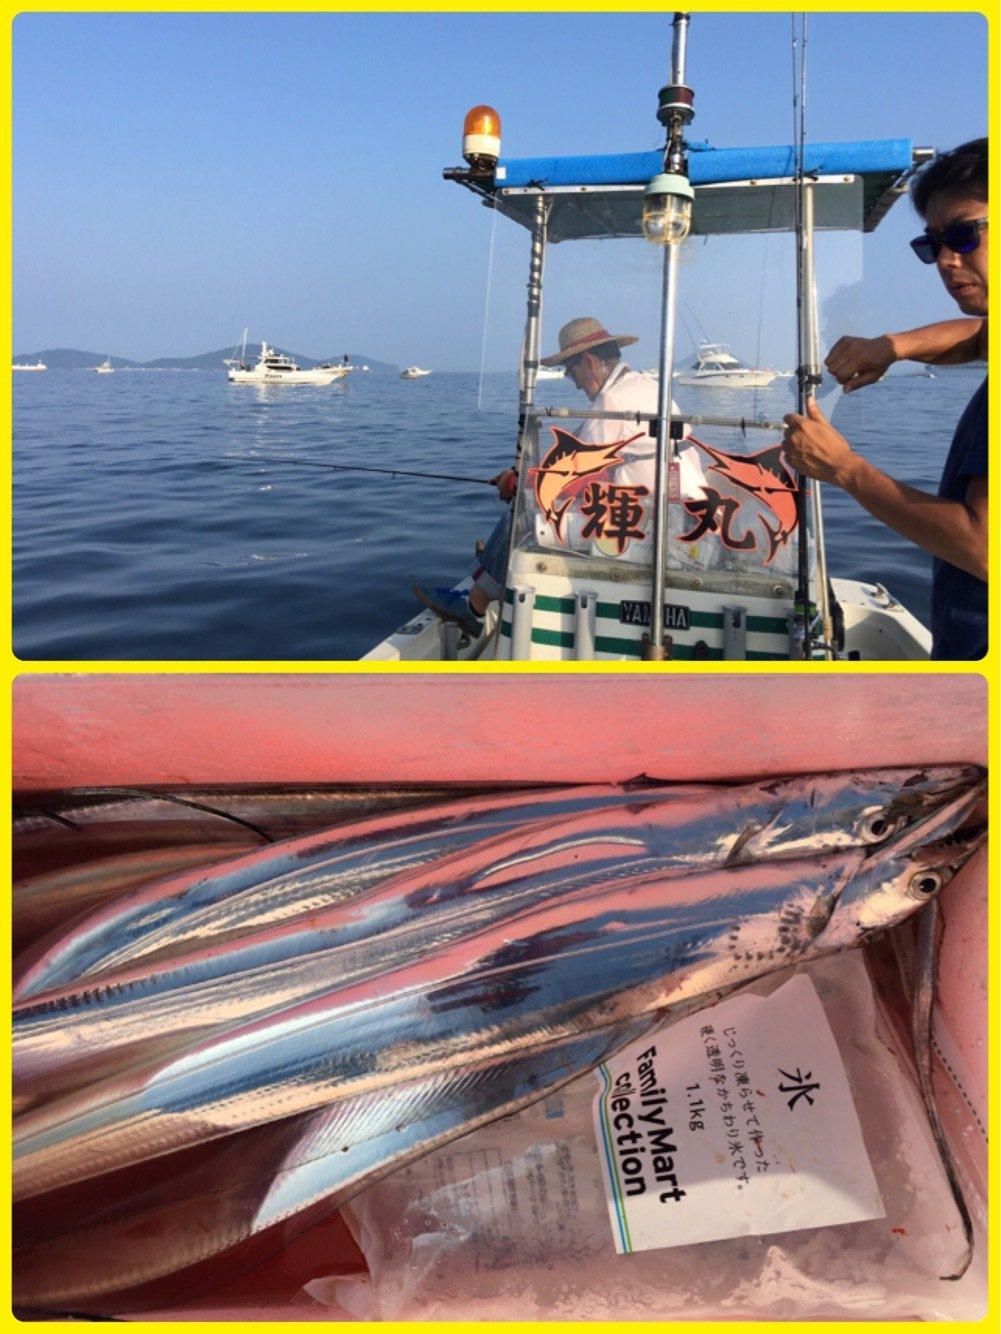 kiyosakuさんの投稿画像,写っている魚はタチウオ